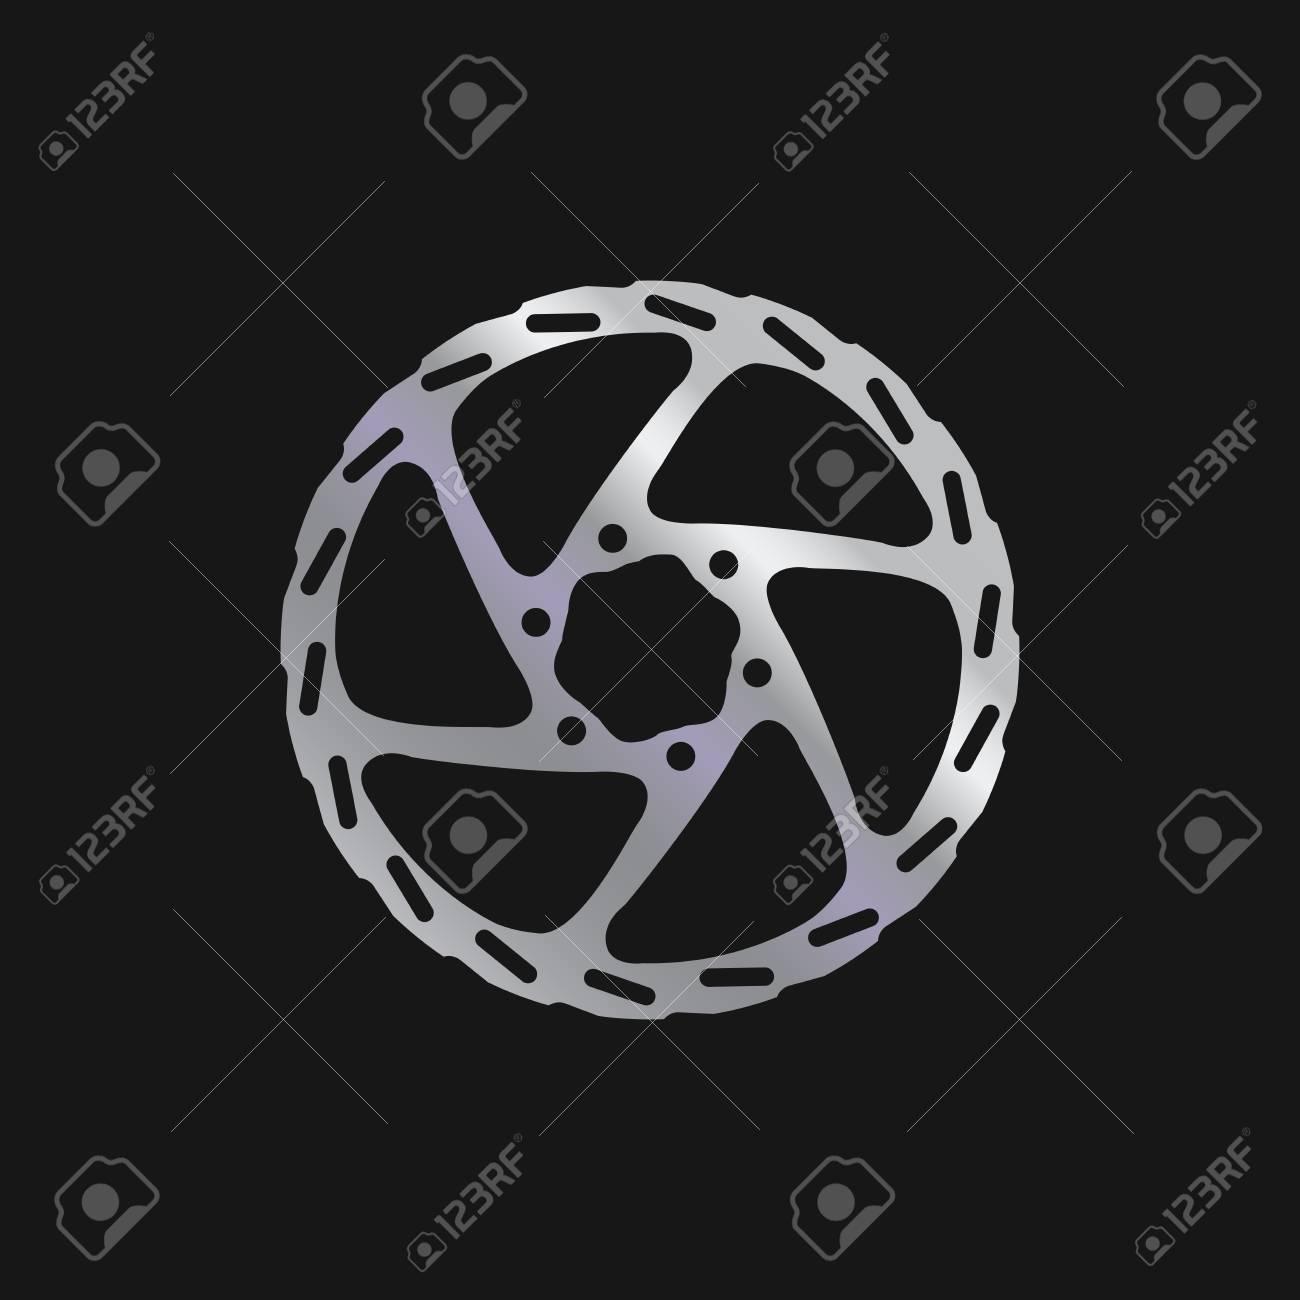 Mtb Bike Bicycle Disc Brake Rotor Realistic Vector Illustration